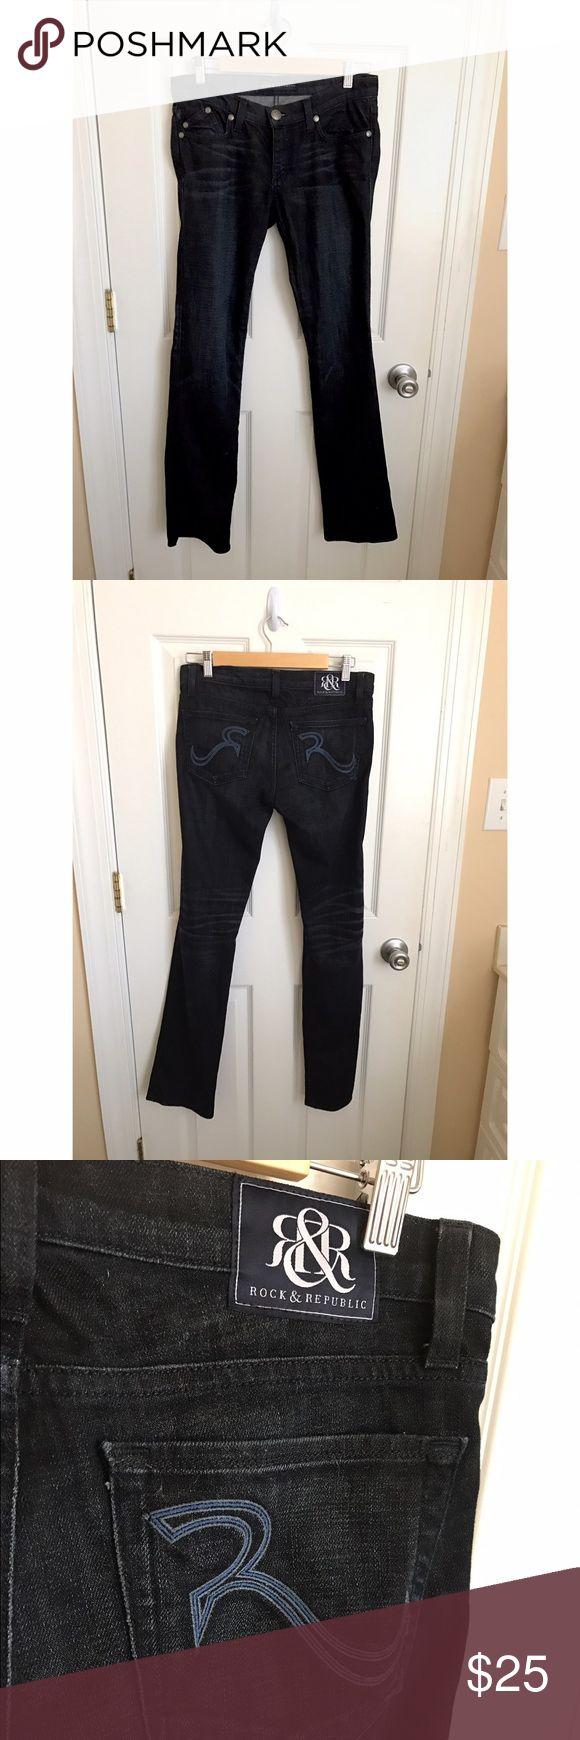 "NWOT dark jeans Straight leg boot cut designer rock & republic. Brand new never been worn. 32"" inseam Rock & Republic Jeans"